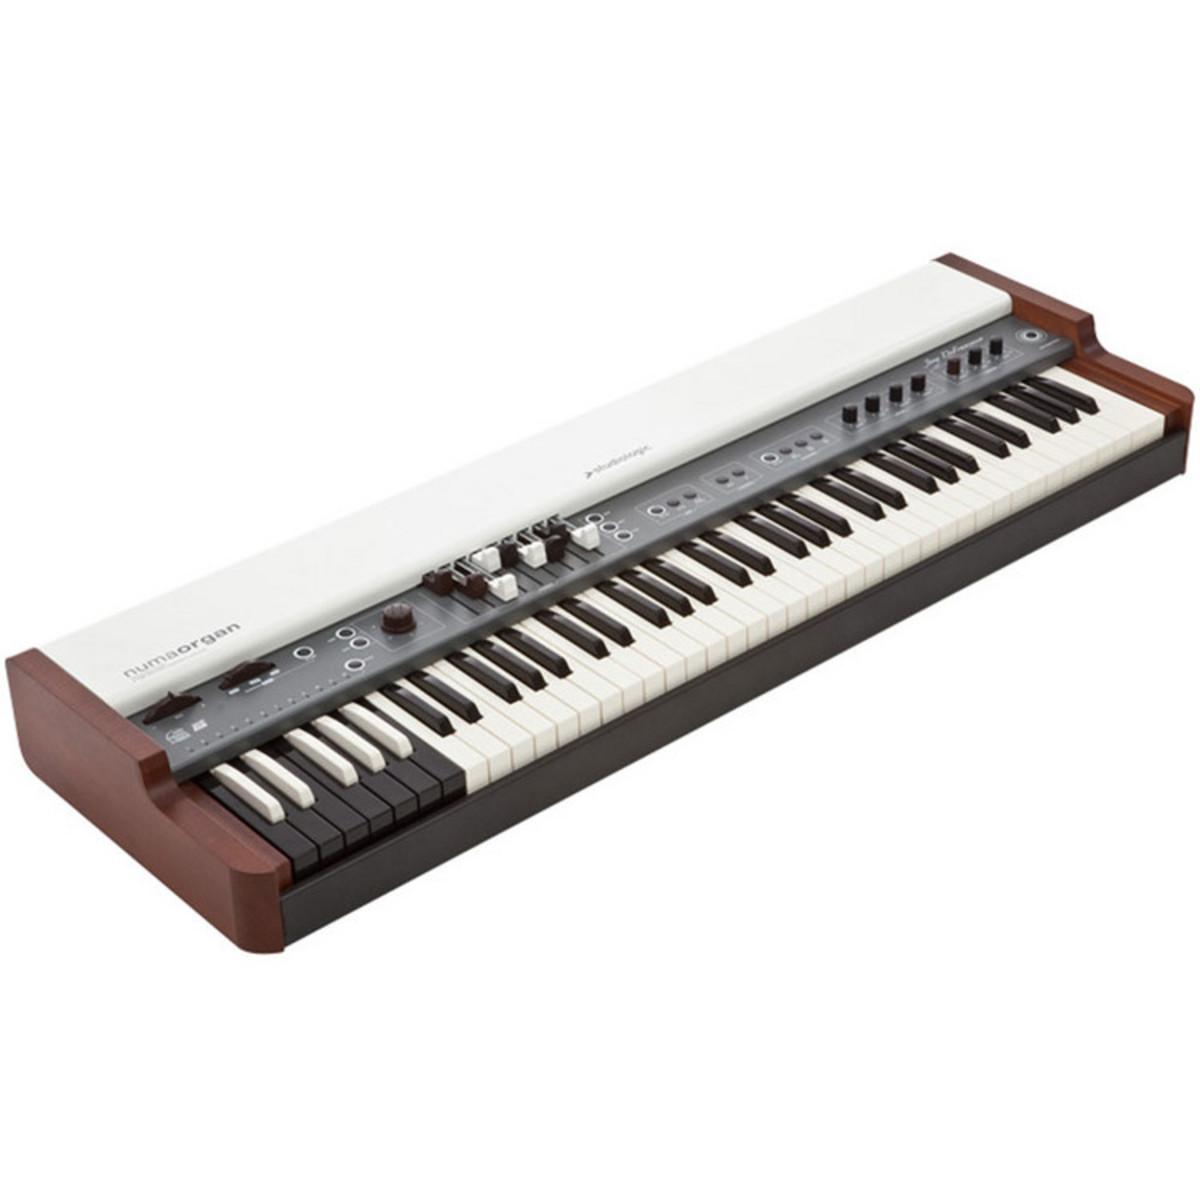 disc studiologic numa organ master midi controller at. Black Bedroom Furniture Sets. Home Design Ideas